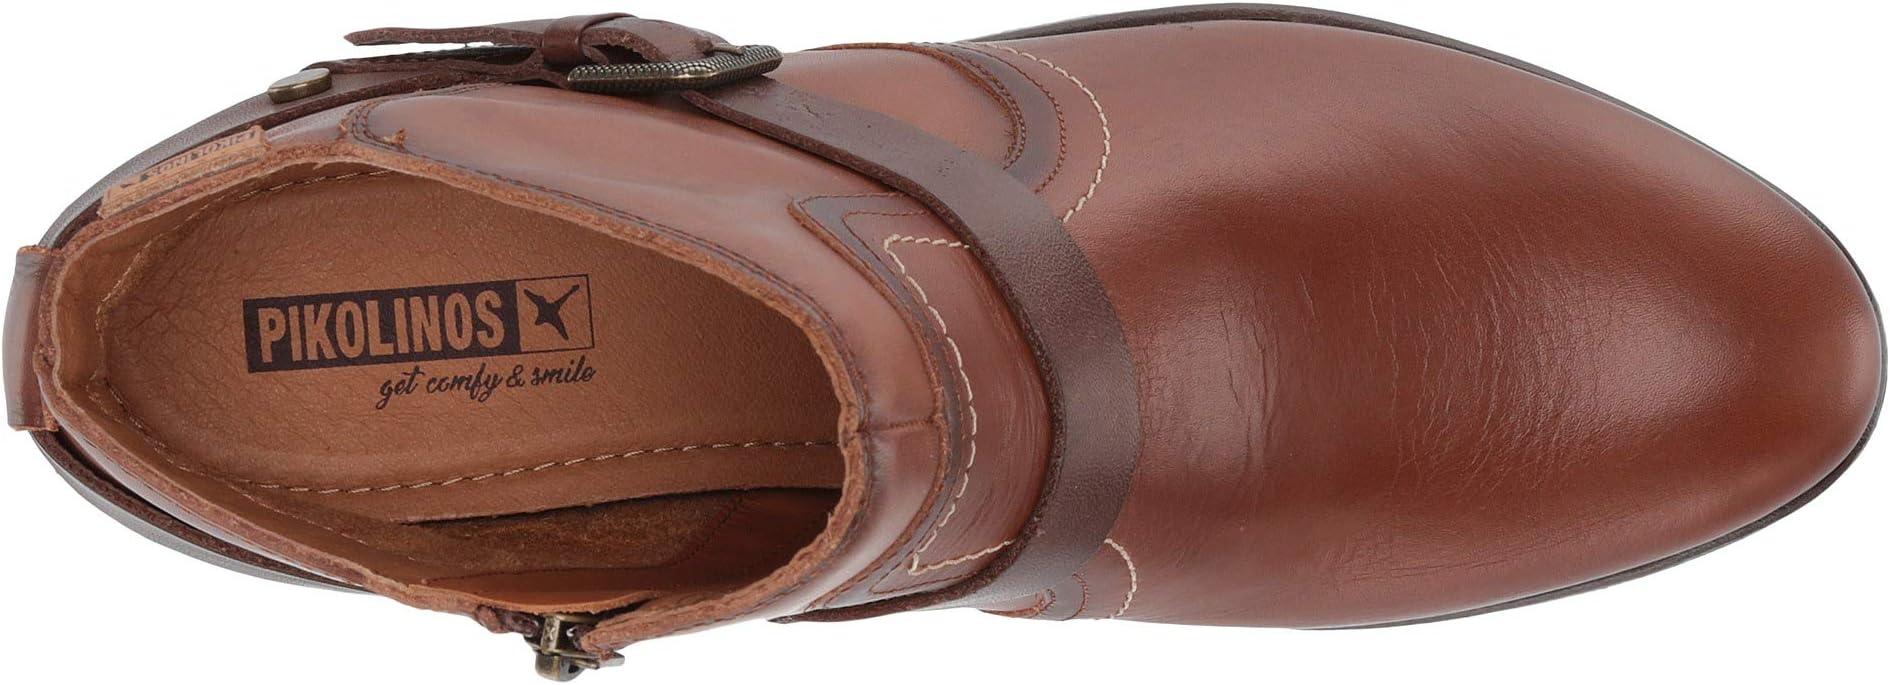 Pikolinos Ordino W8M-8644   Women's shoes   2020 Newest